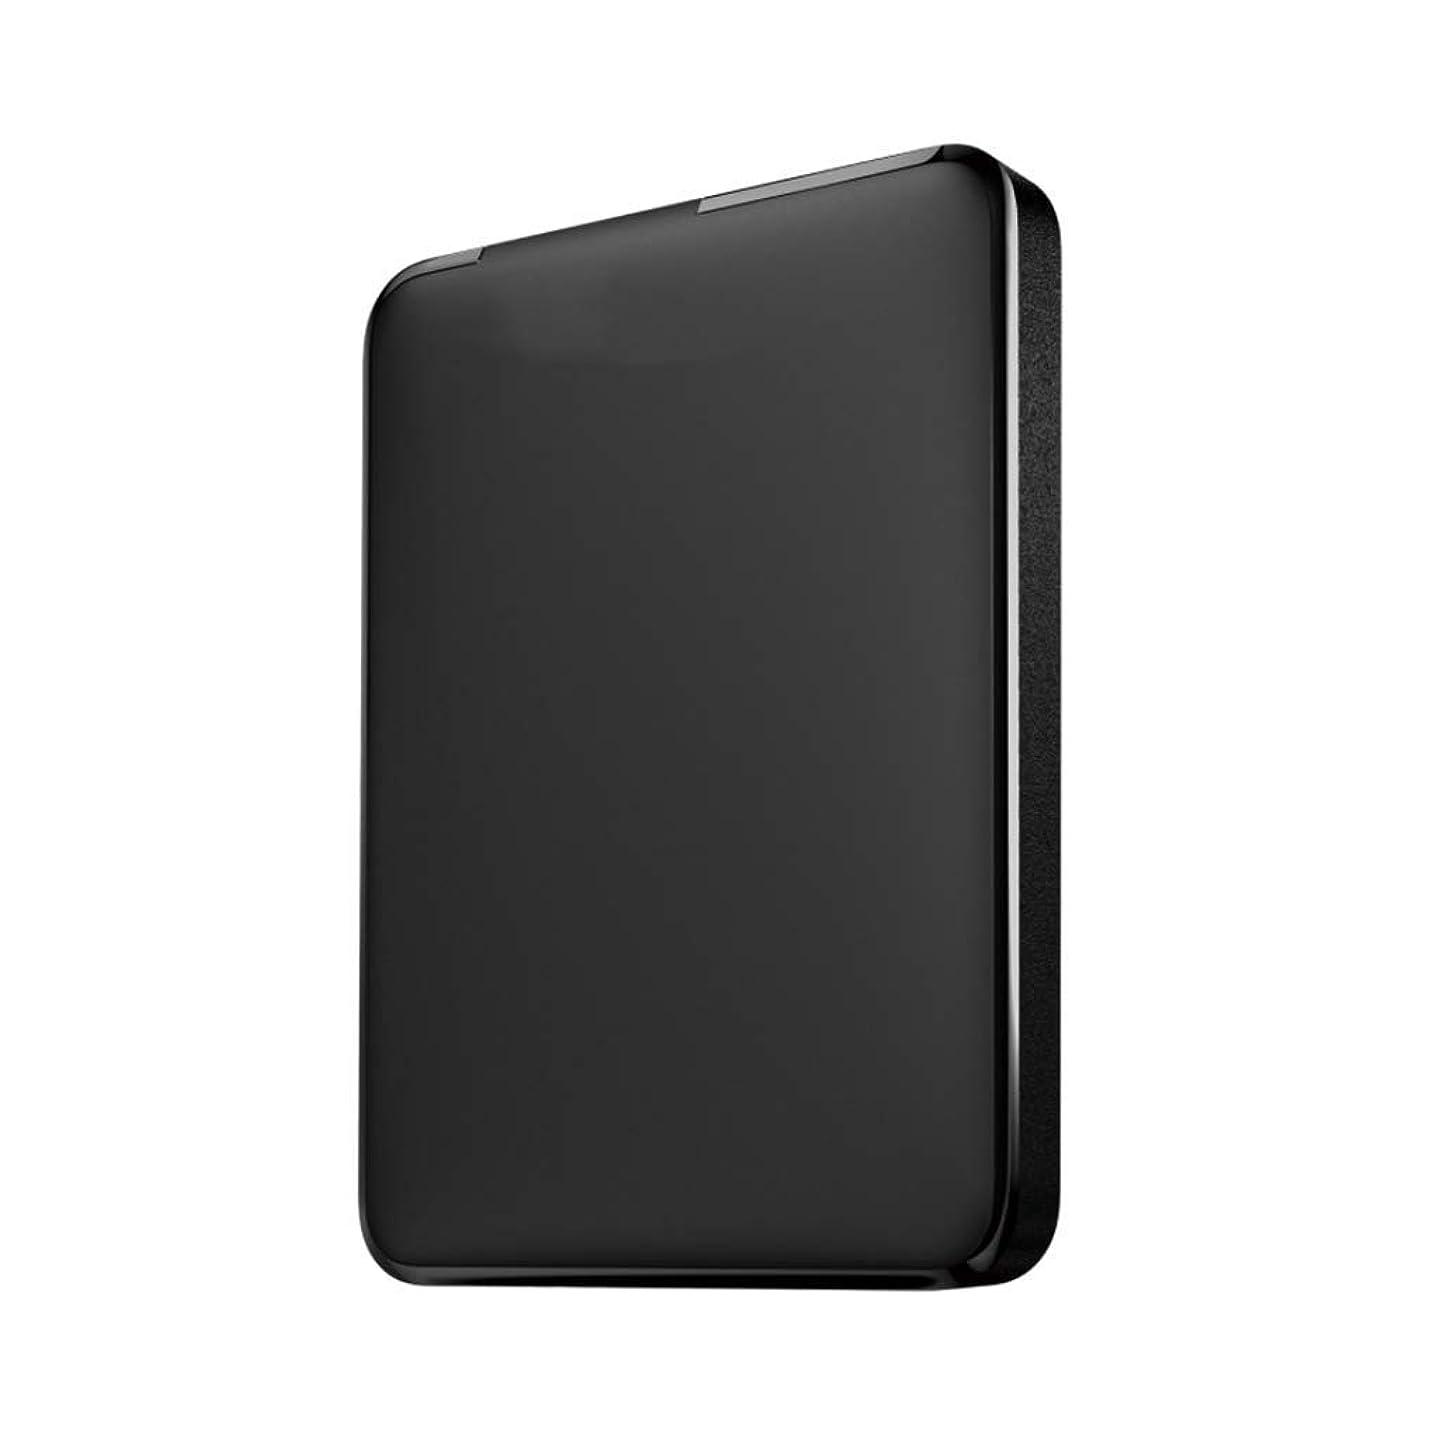 Mobile Hard Disk 80G/160G/250G/320G/500G/1TB Large-Capacity Memory 2.5-inch USB3.0 Computer External Mobile Hard Disk Black (Size : 1TB.)